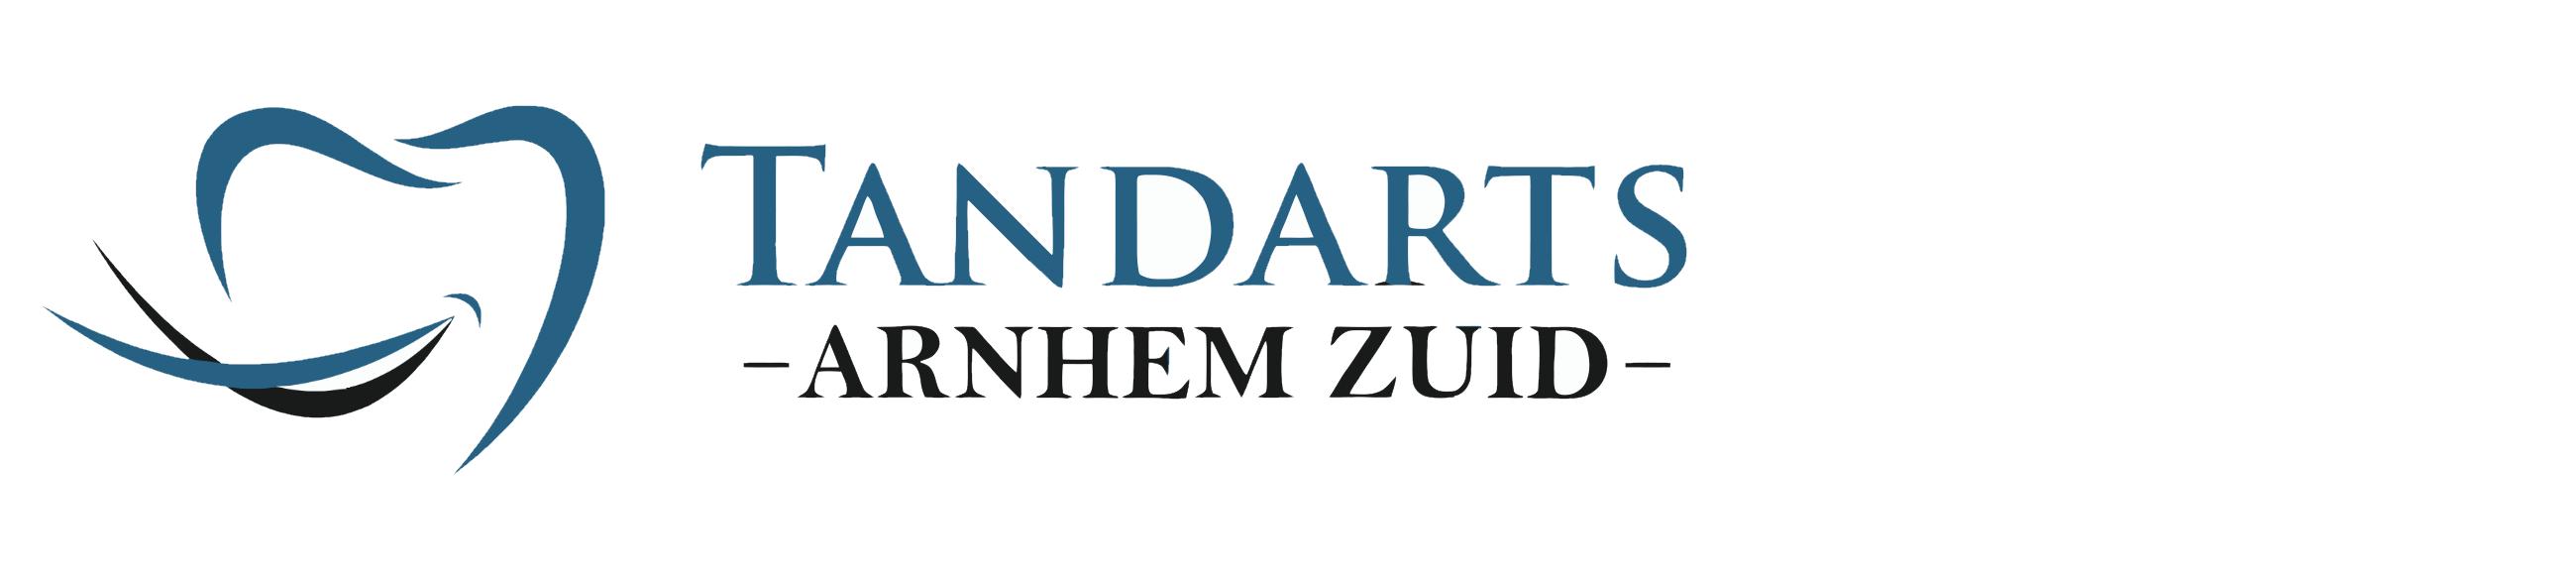 Tandarts Arnhem Zuid